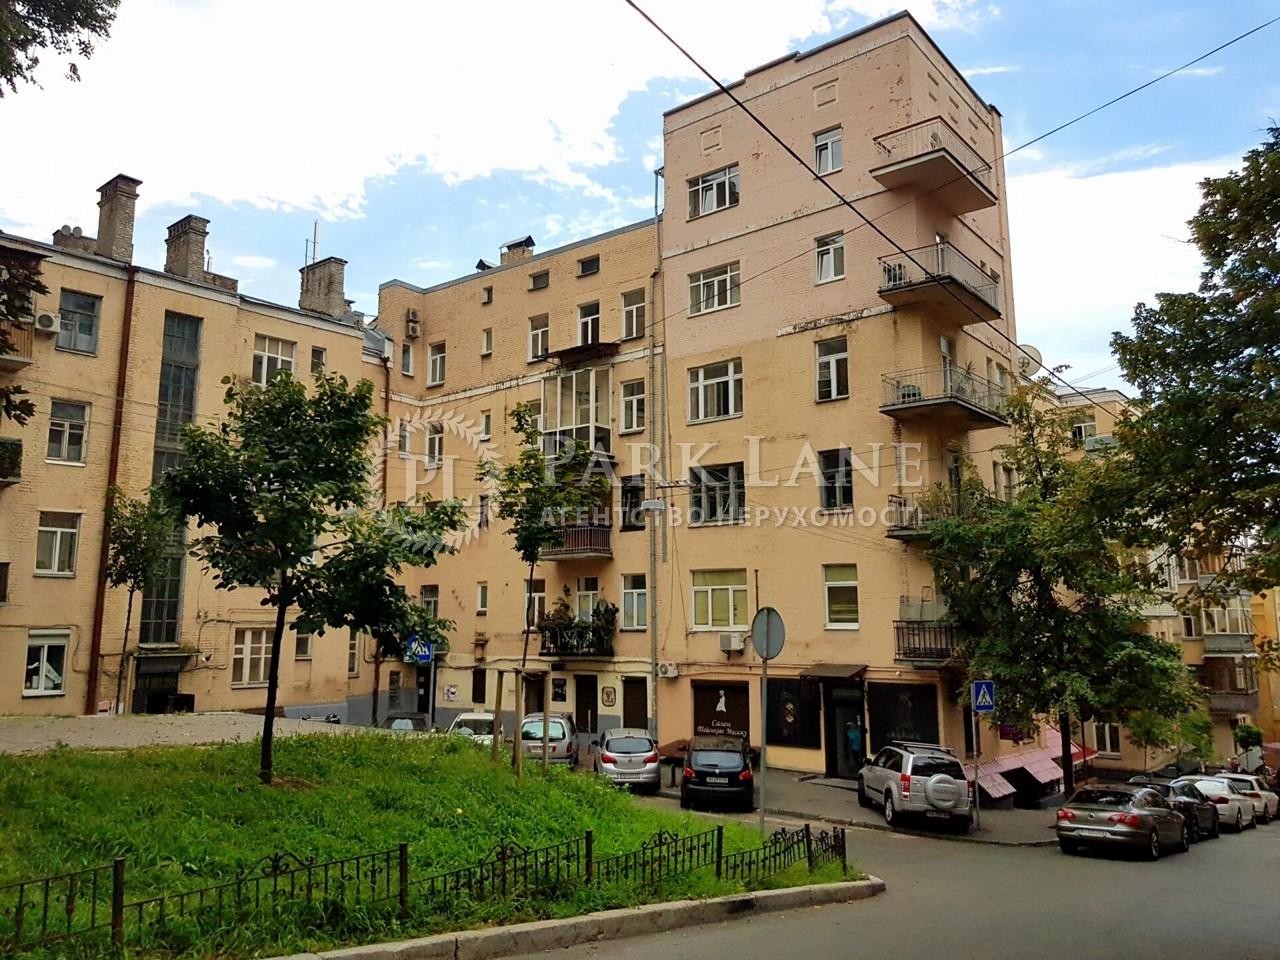 Квартира ул. Костельная, 6, Киев, B-100461 - Фото 1